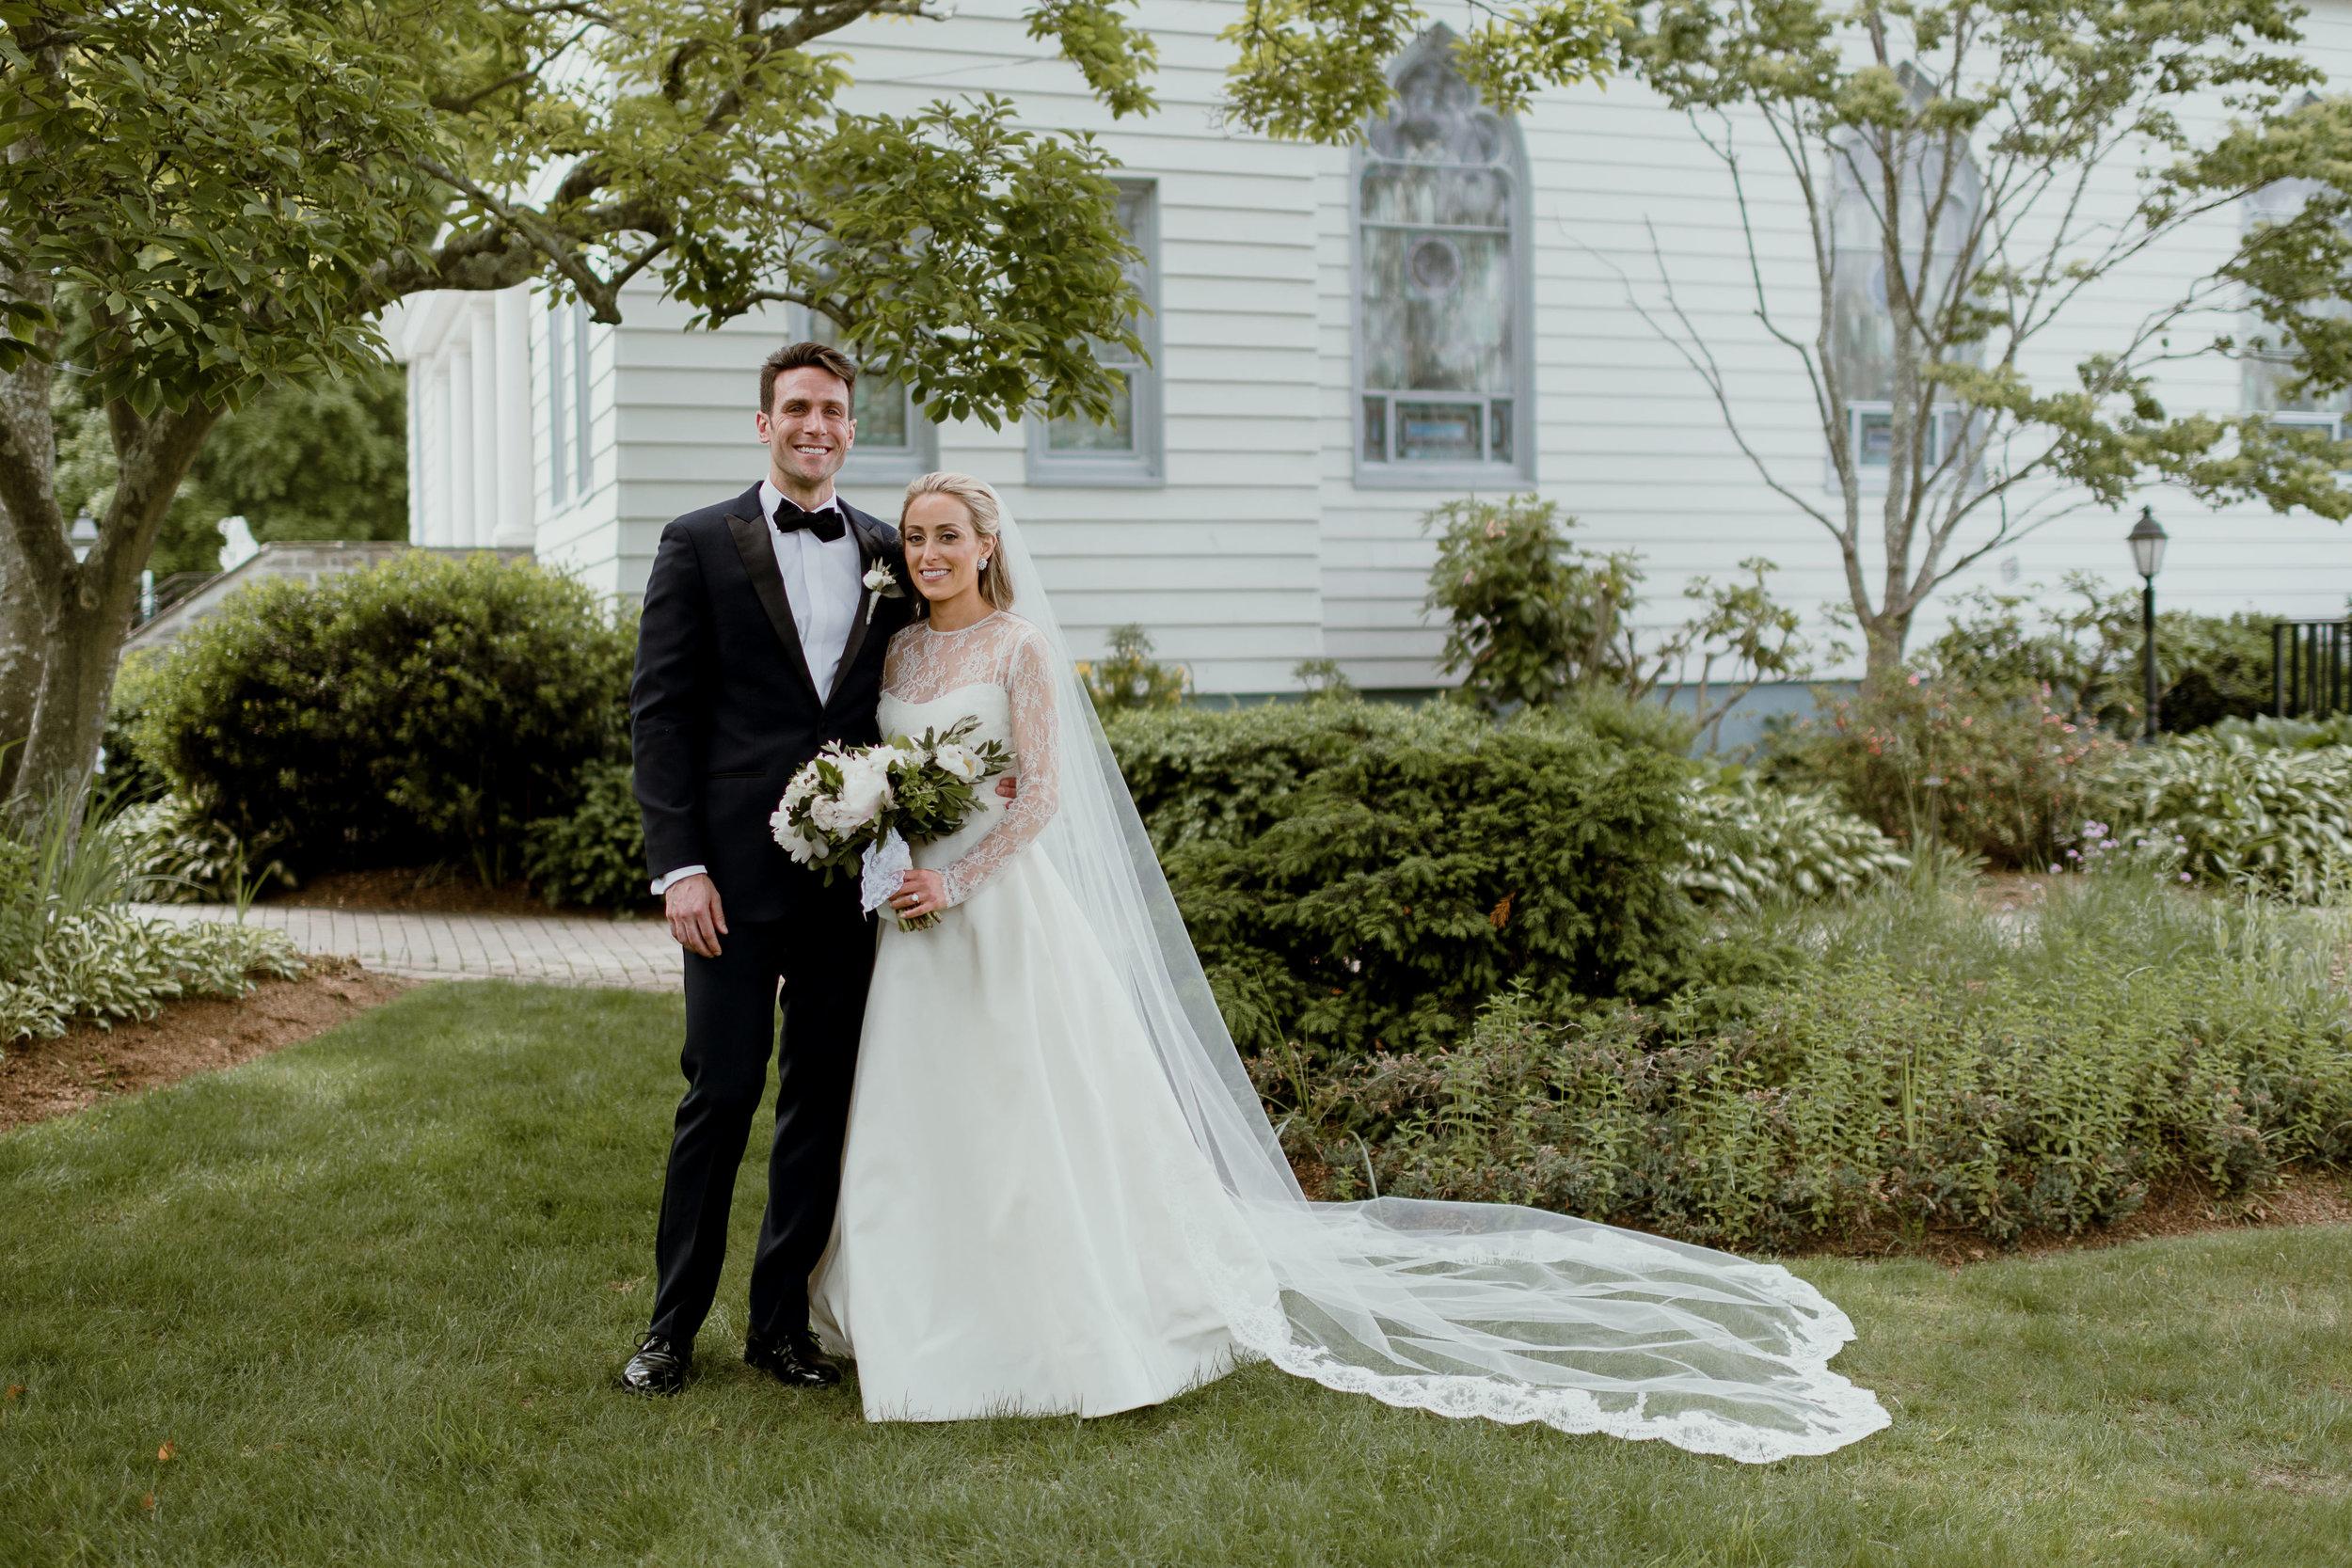 Green & White Wedding Jonathon Edwards Vineyard Wedding0-569.jpg